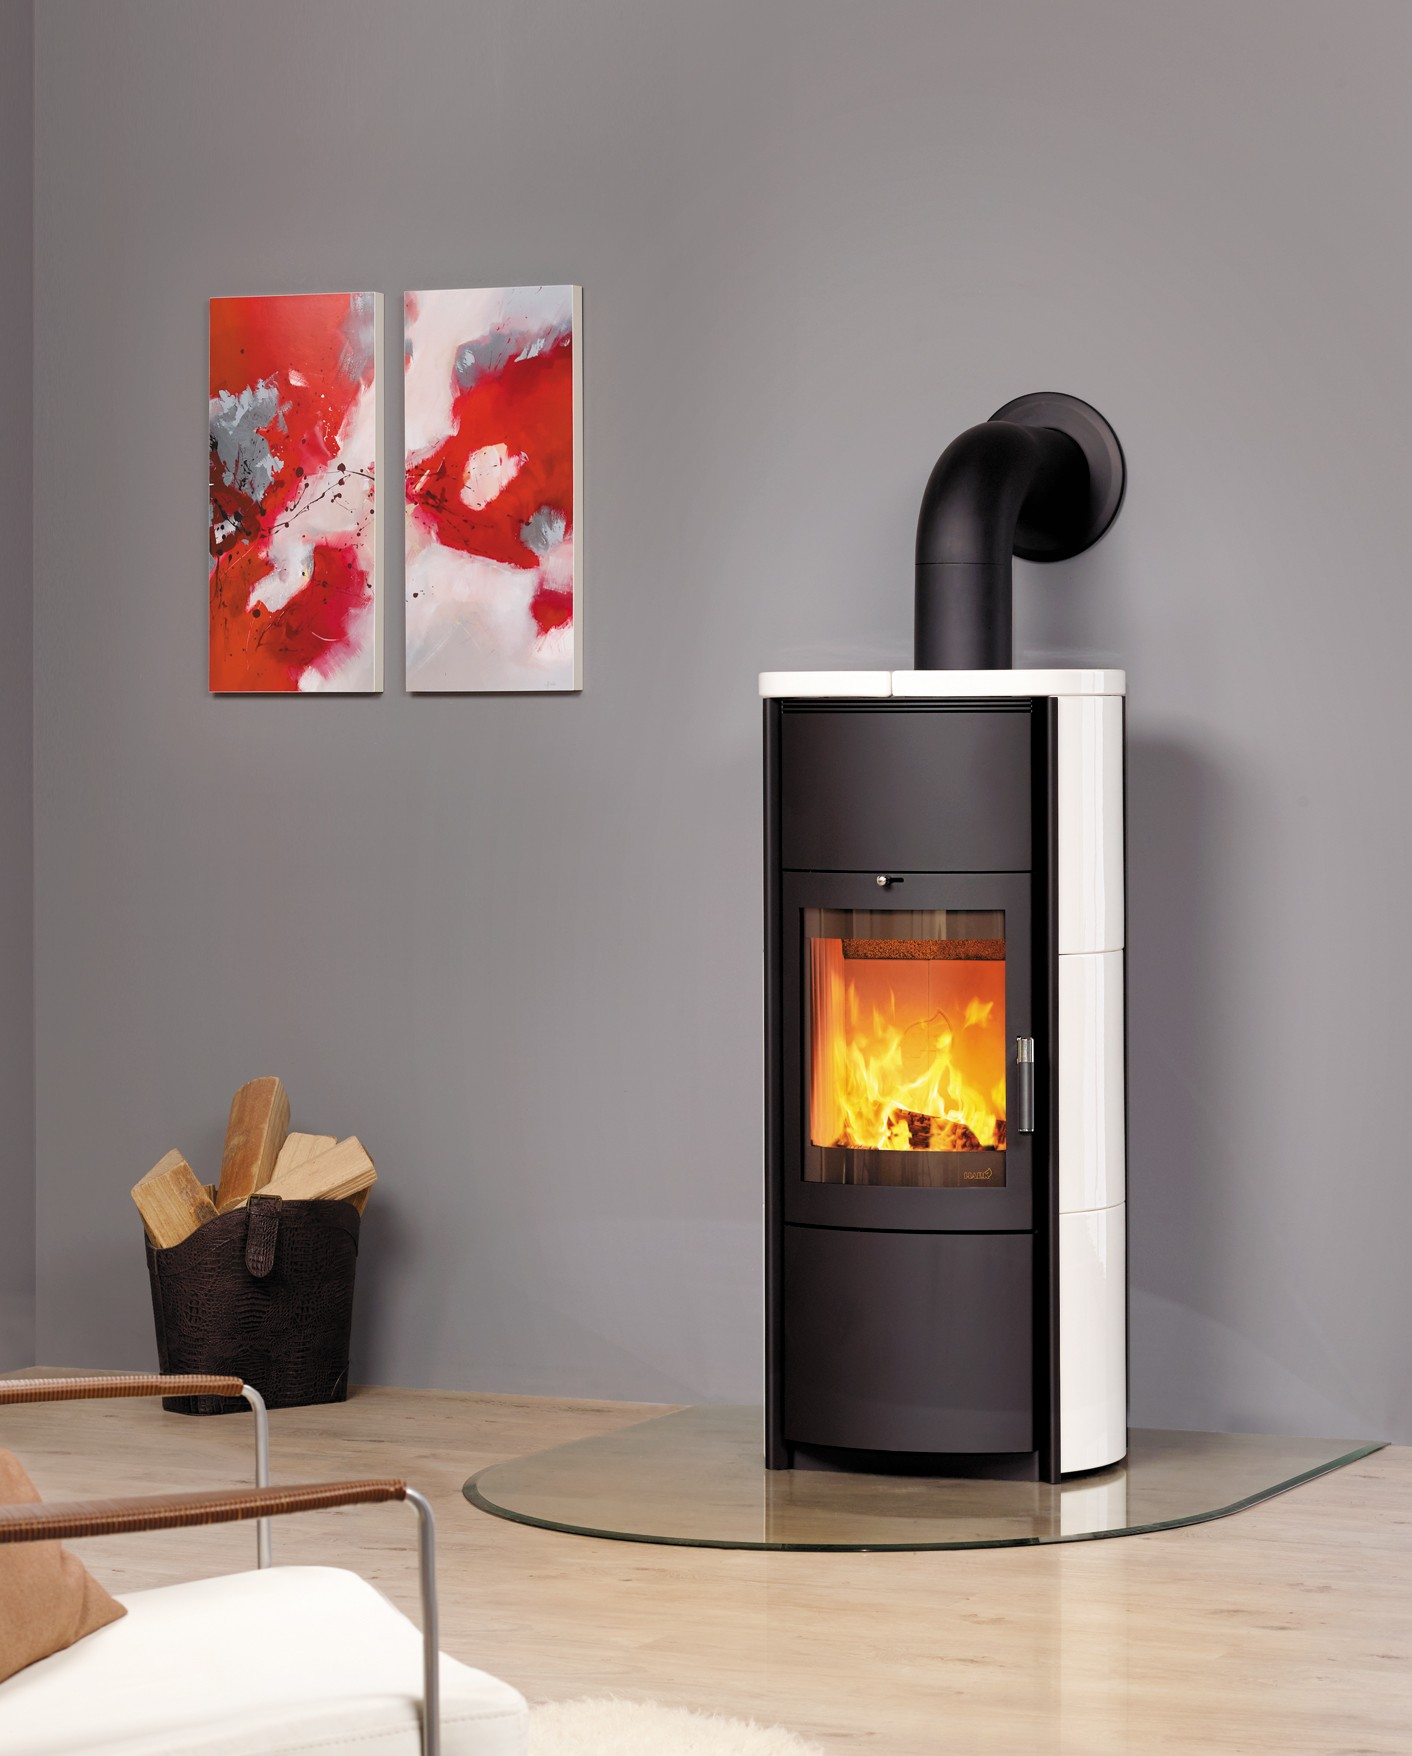 Favorit Kaminofen / Dauerbrandofen Hark Keno ECOplus Keramik creme-weiß 7 DD18